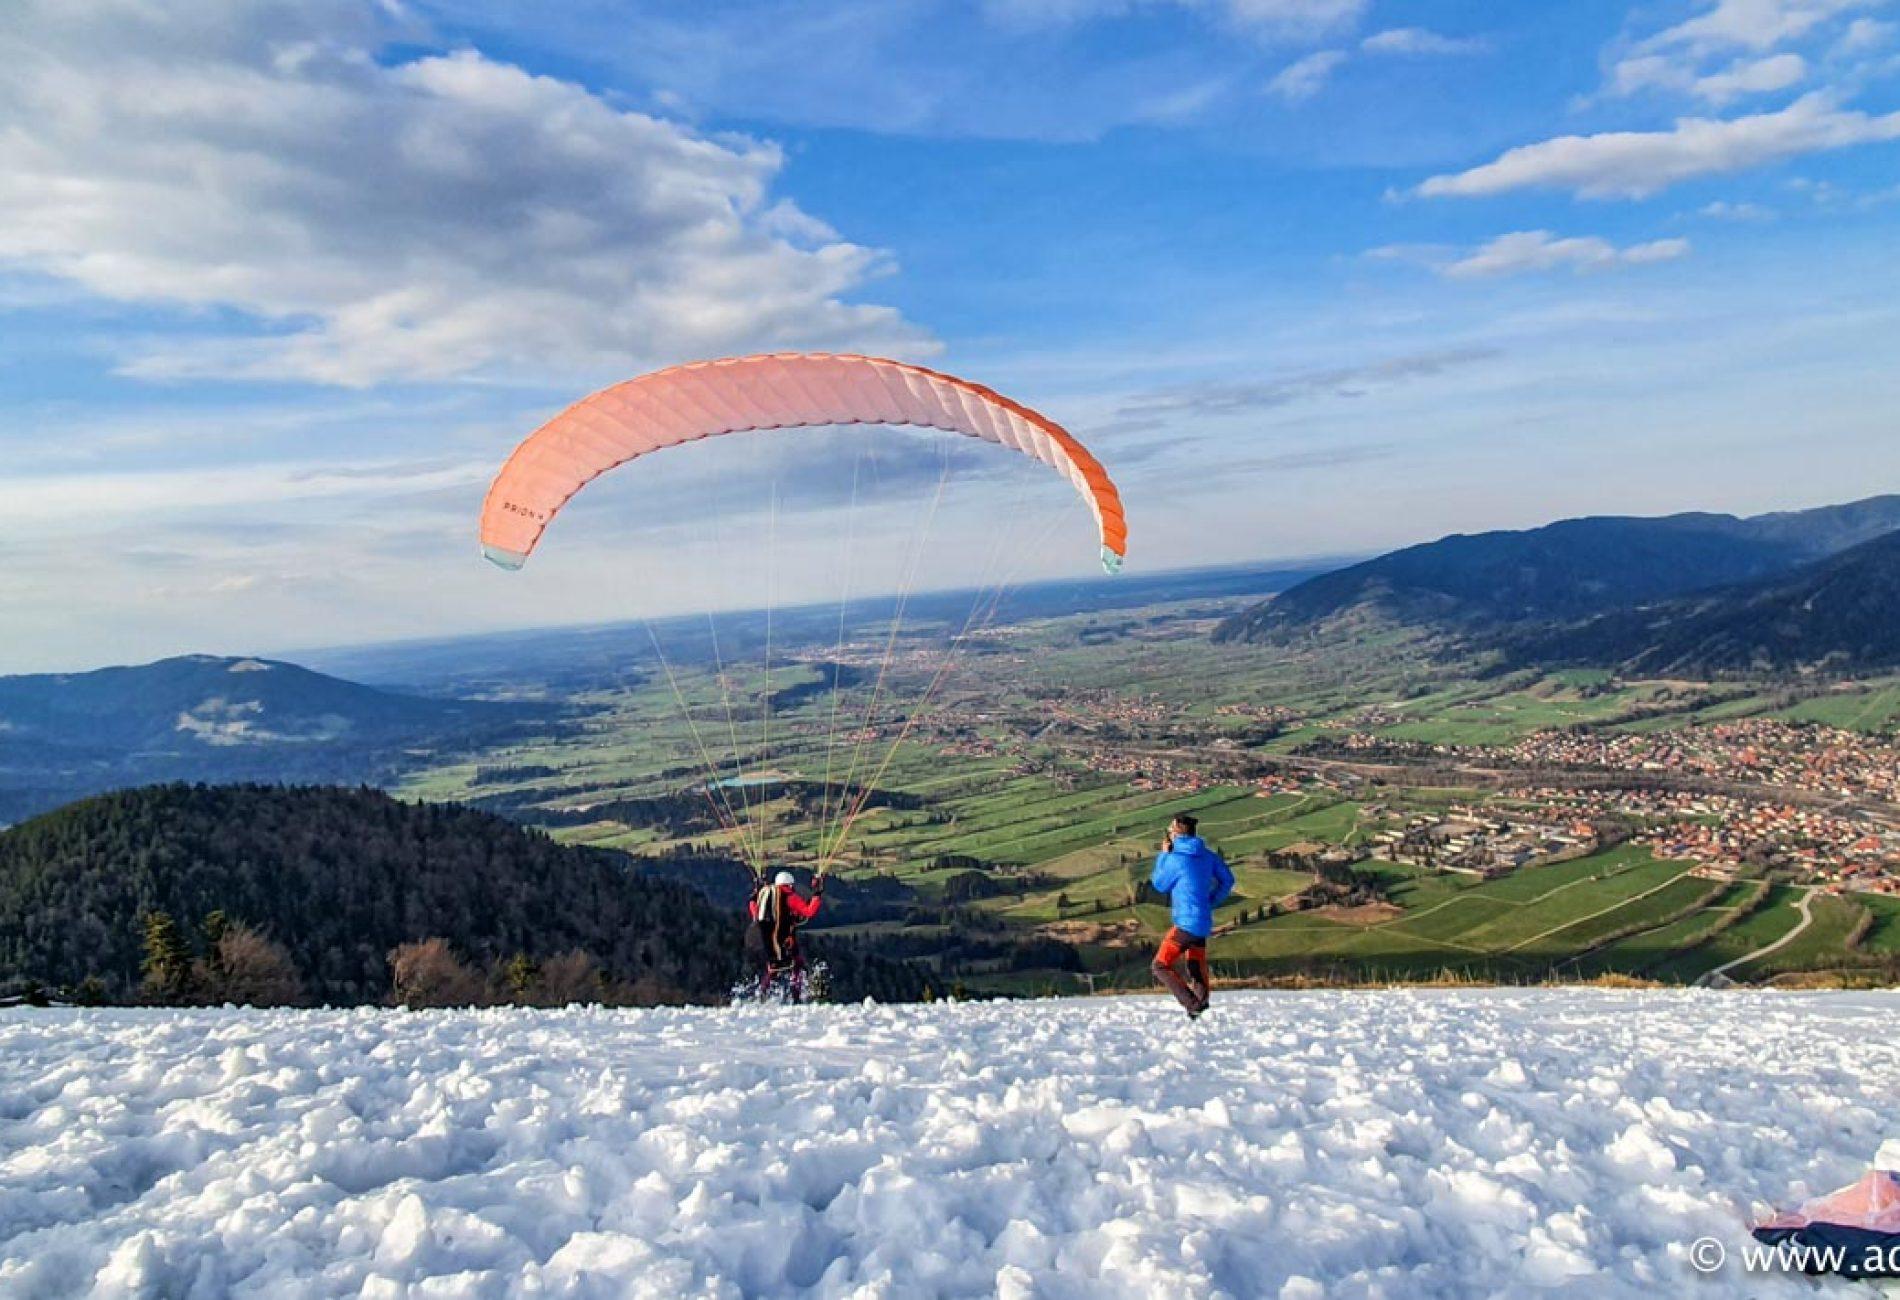 Erste Höhenschulung in 2021 à la Hike & Fly!